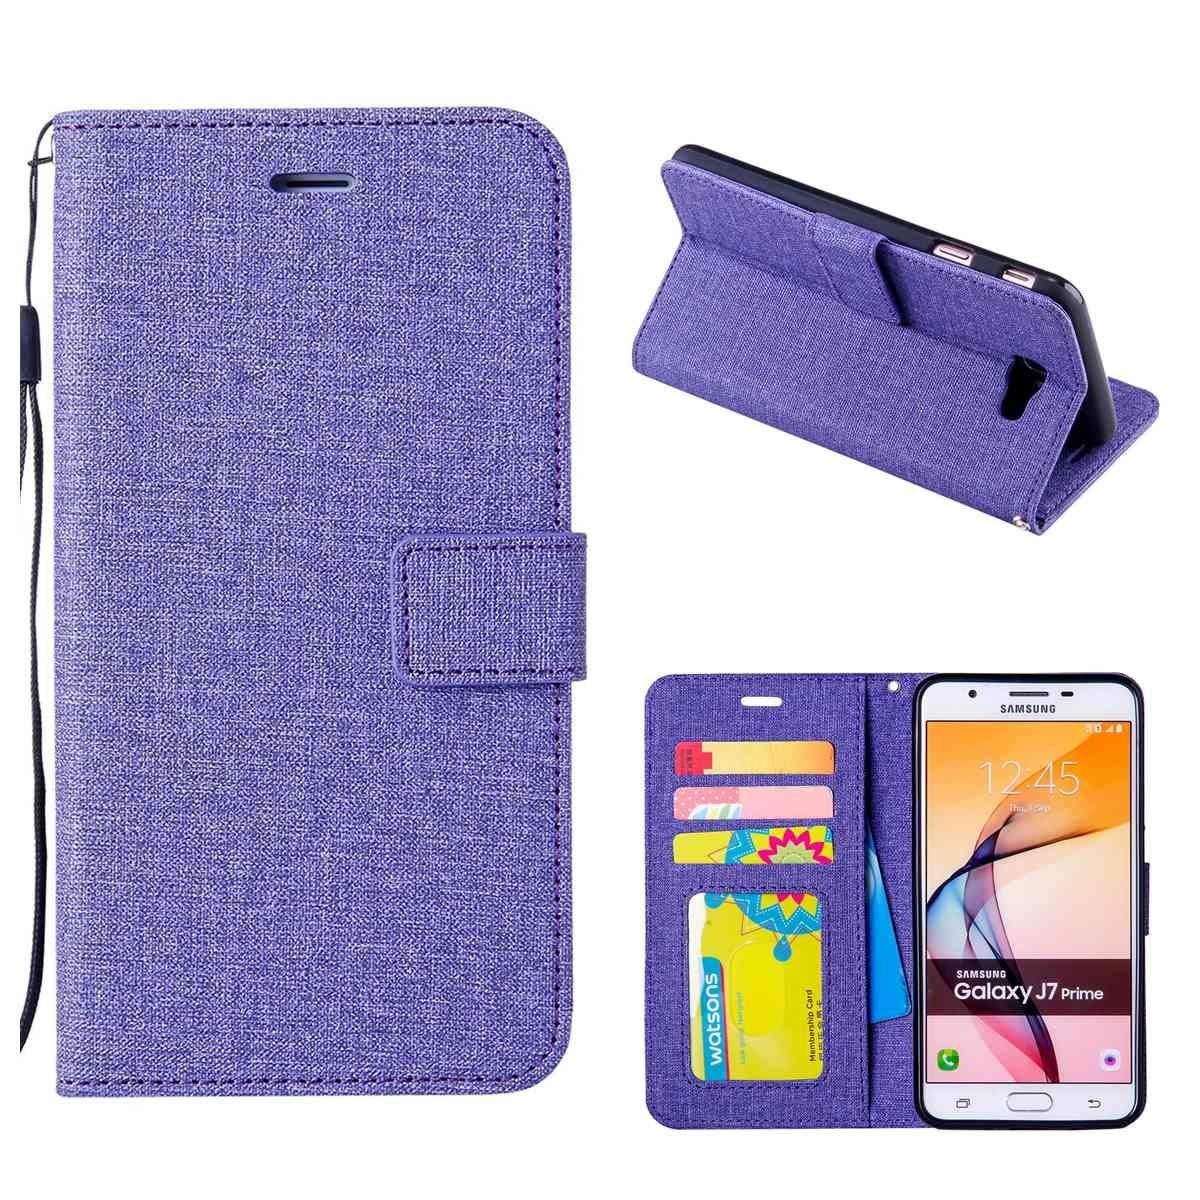 Amazon com: Galaxy J7 Prime Case, HENGHUA 360 Degrees